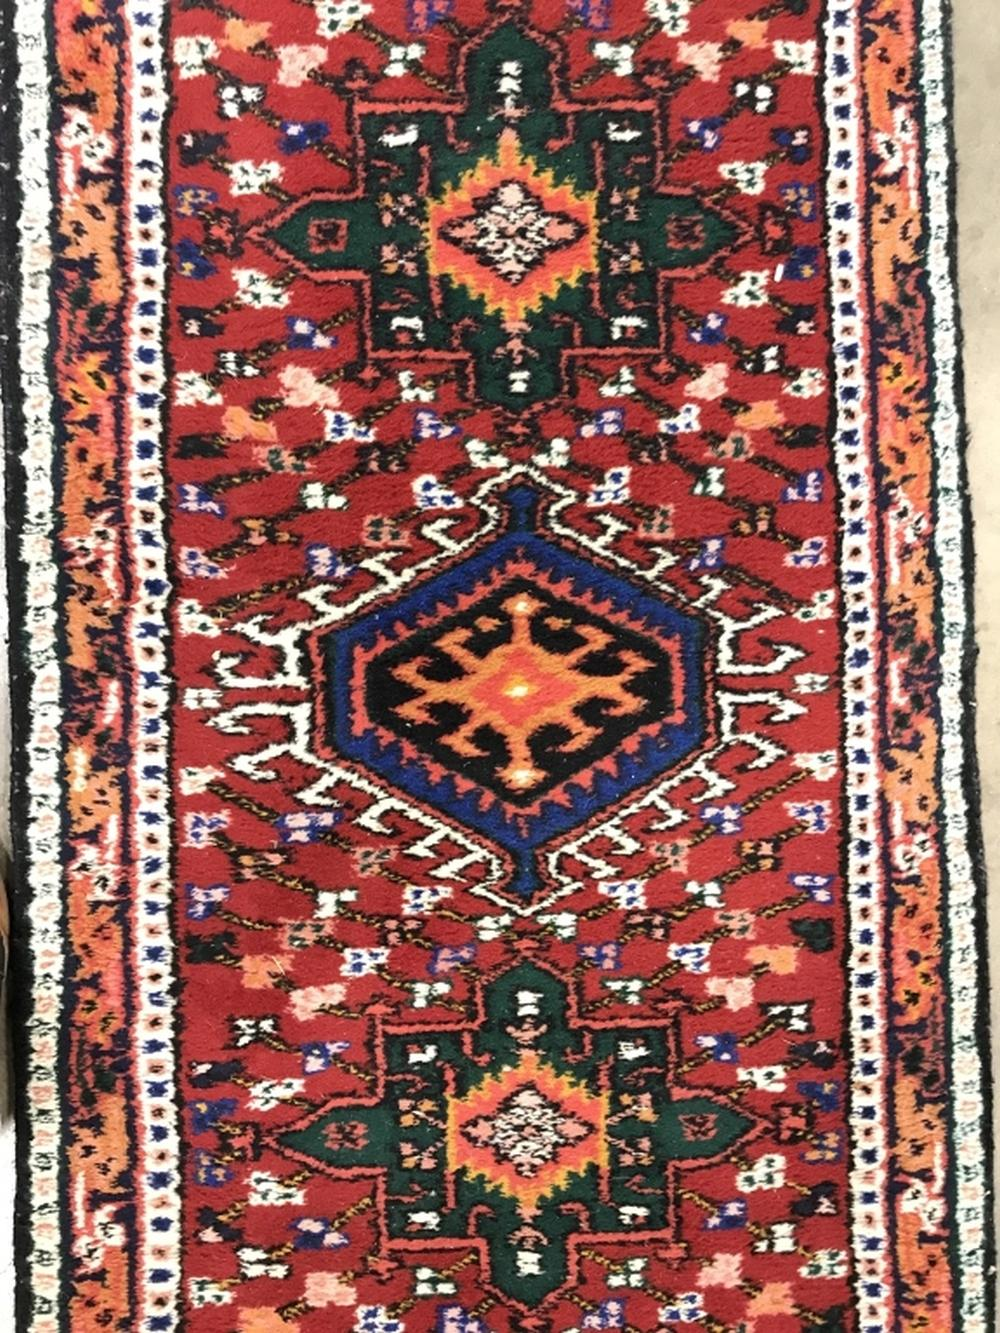 Handmade Multi Toned Persian Wool Runner